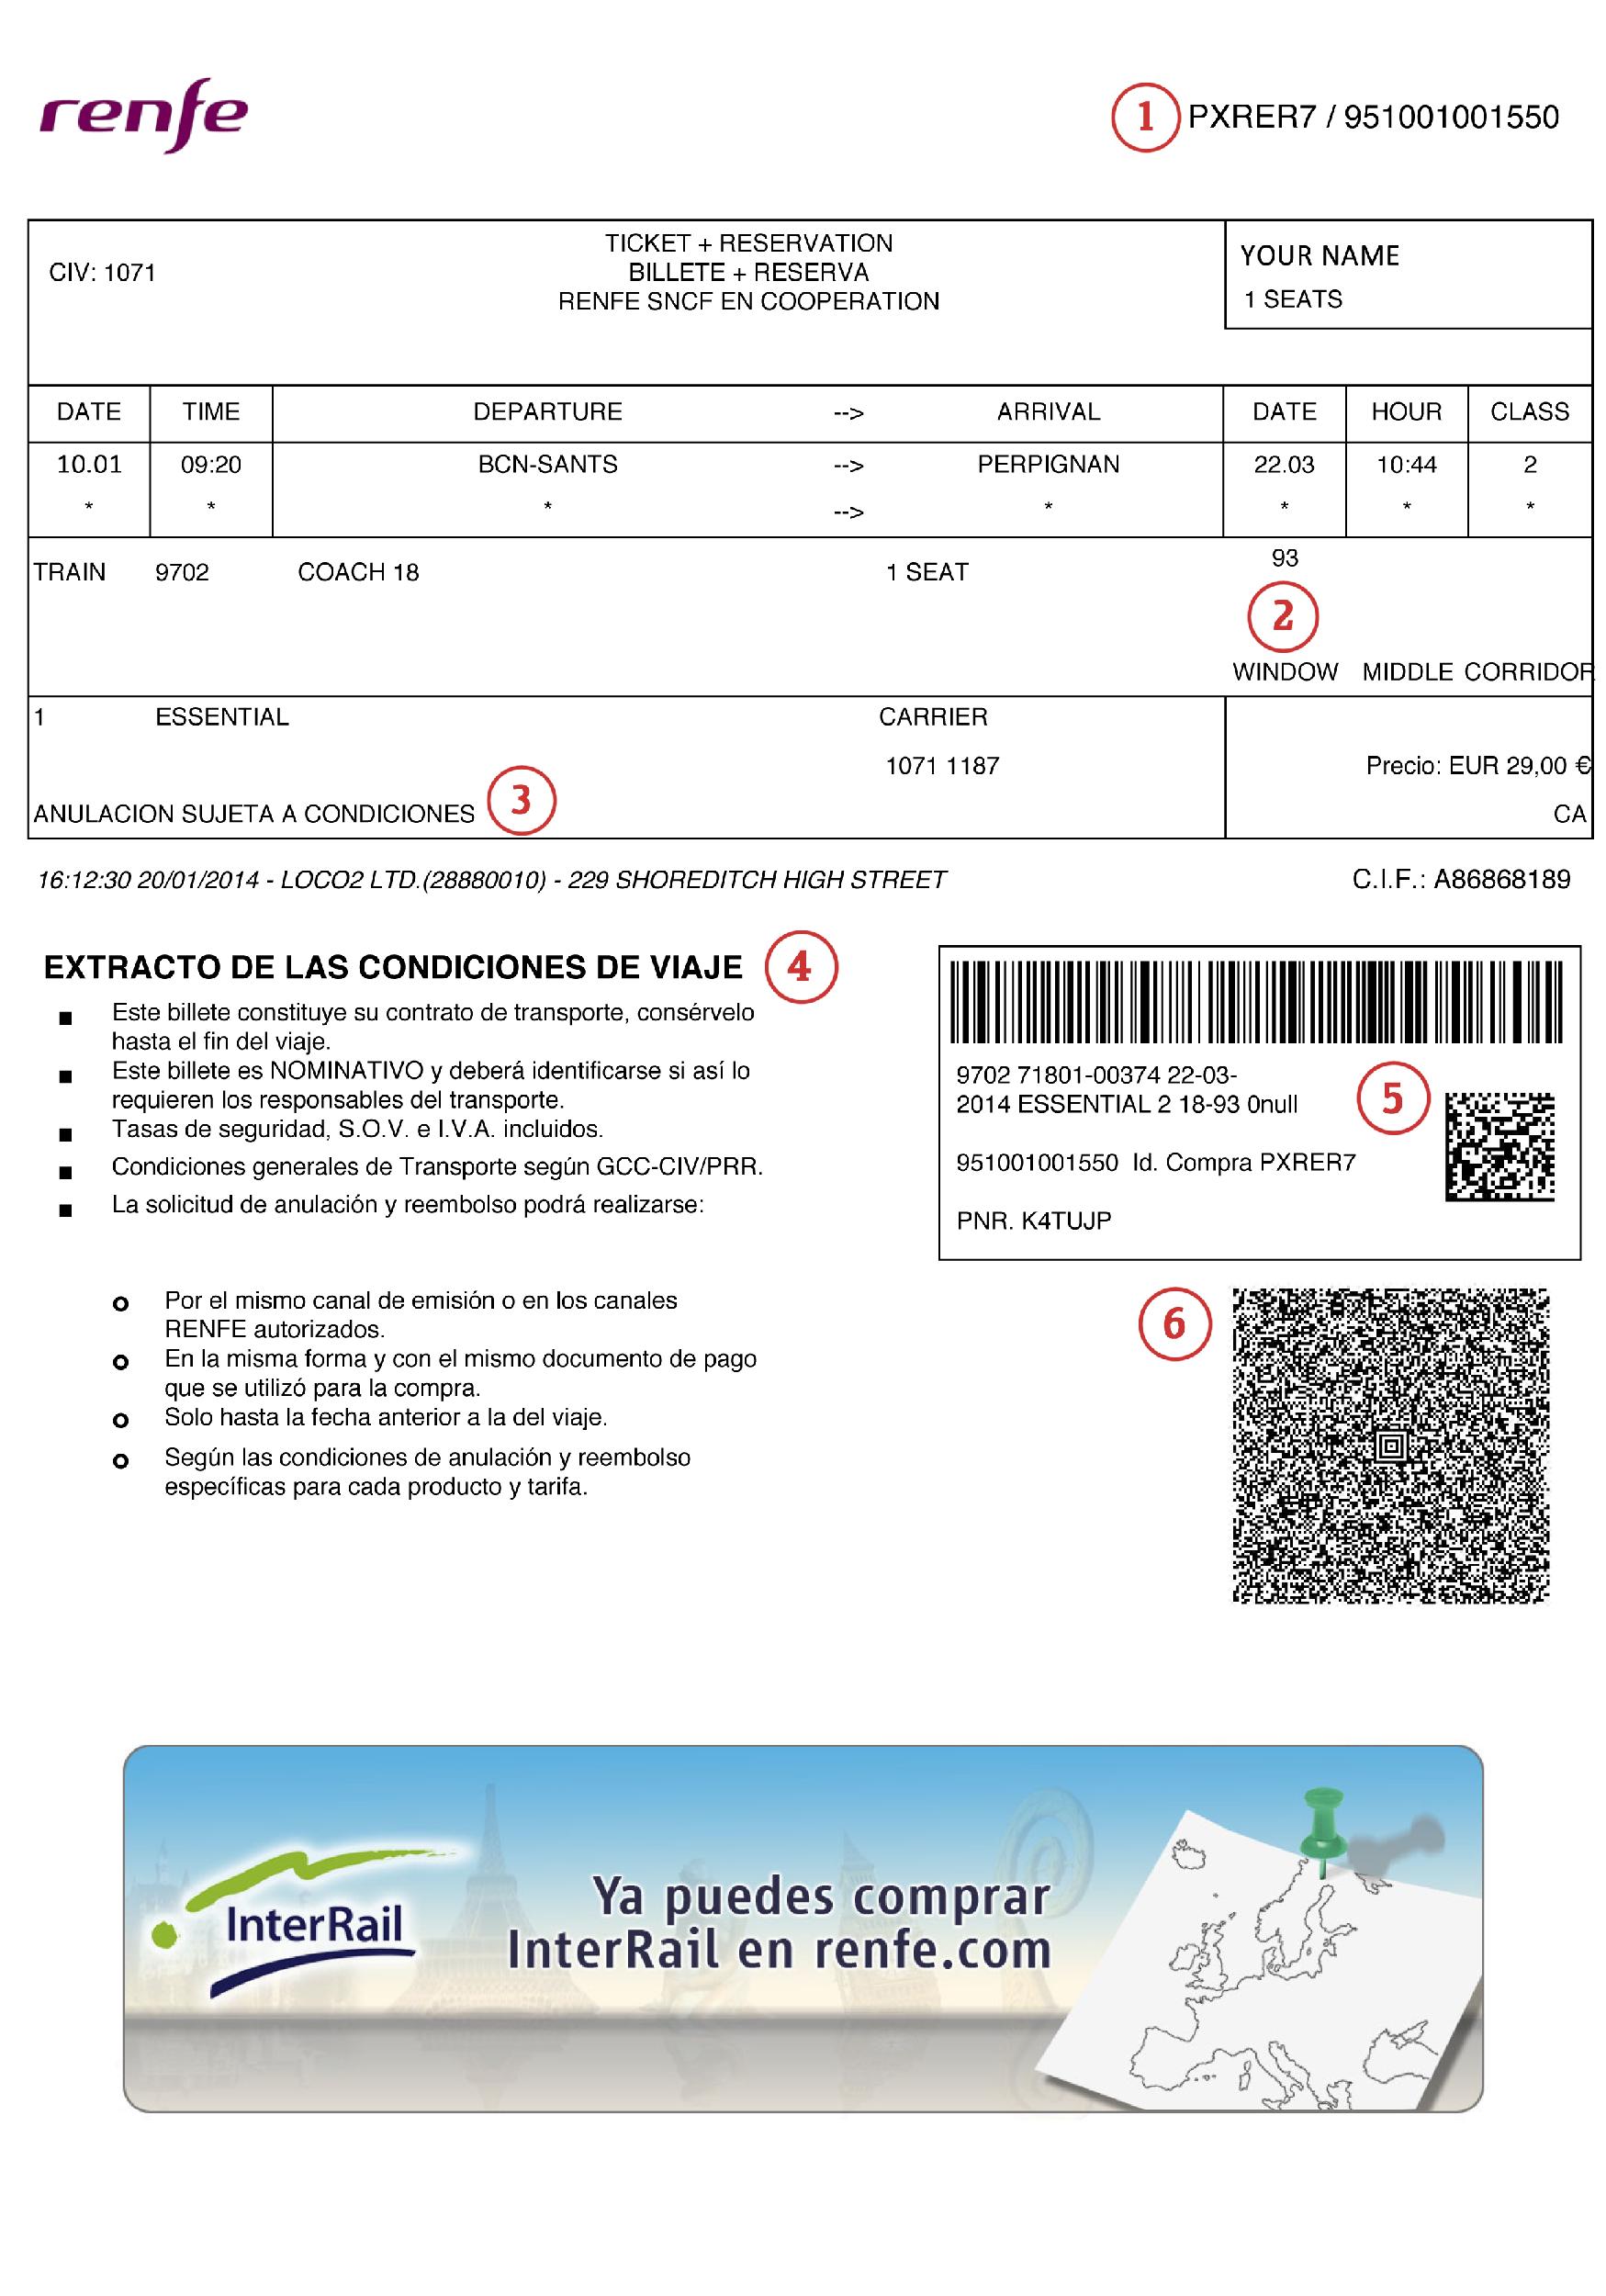 Understanding your Spanish train ticket - Loco2 Help